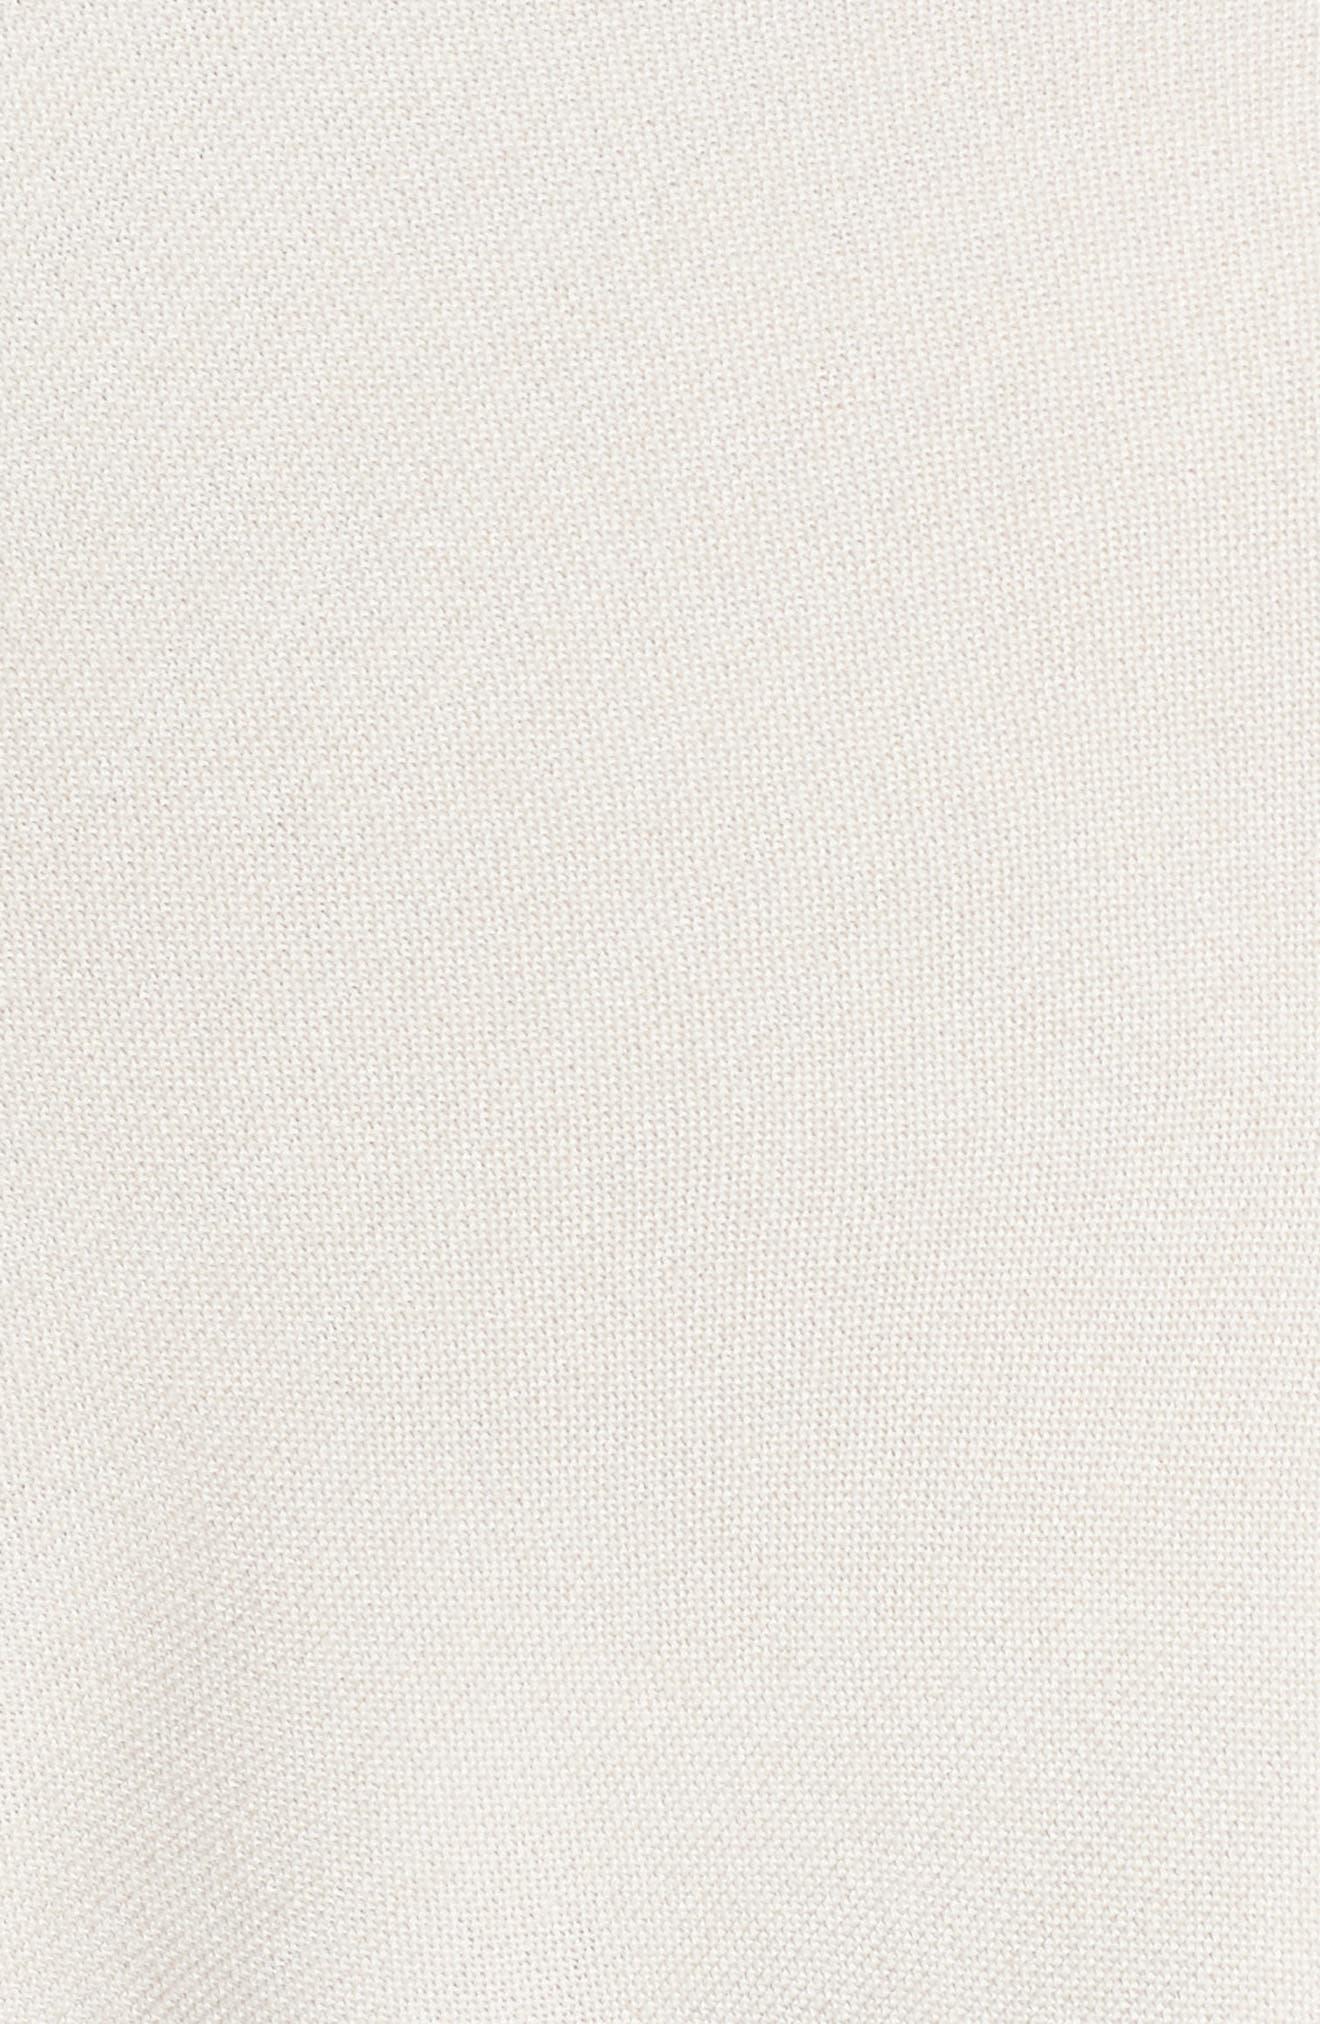 Wool Blend Knit Vest,                             Alternate thumbnail 5, color,                             054